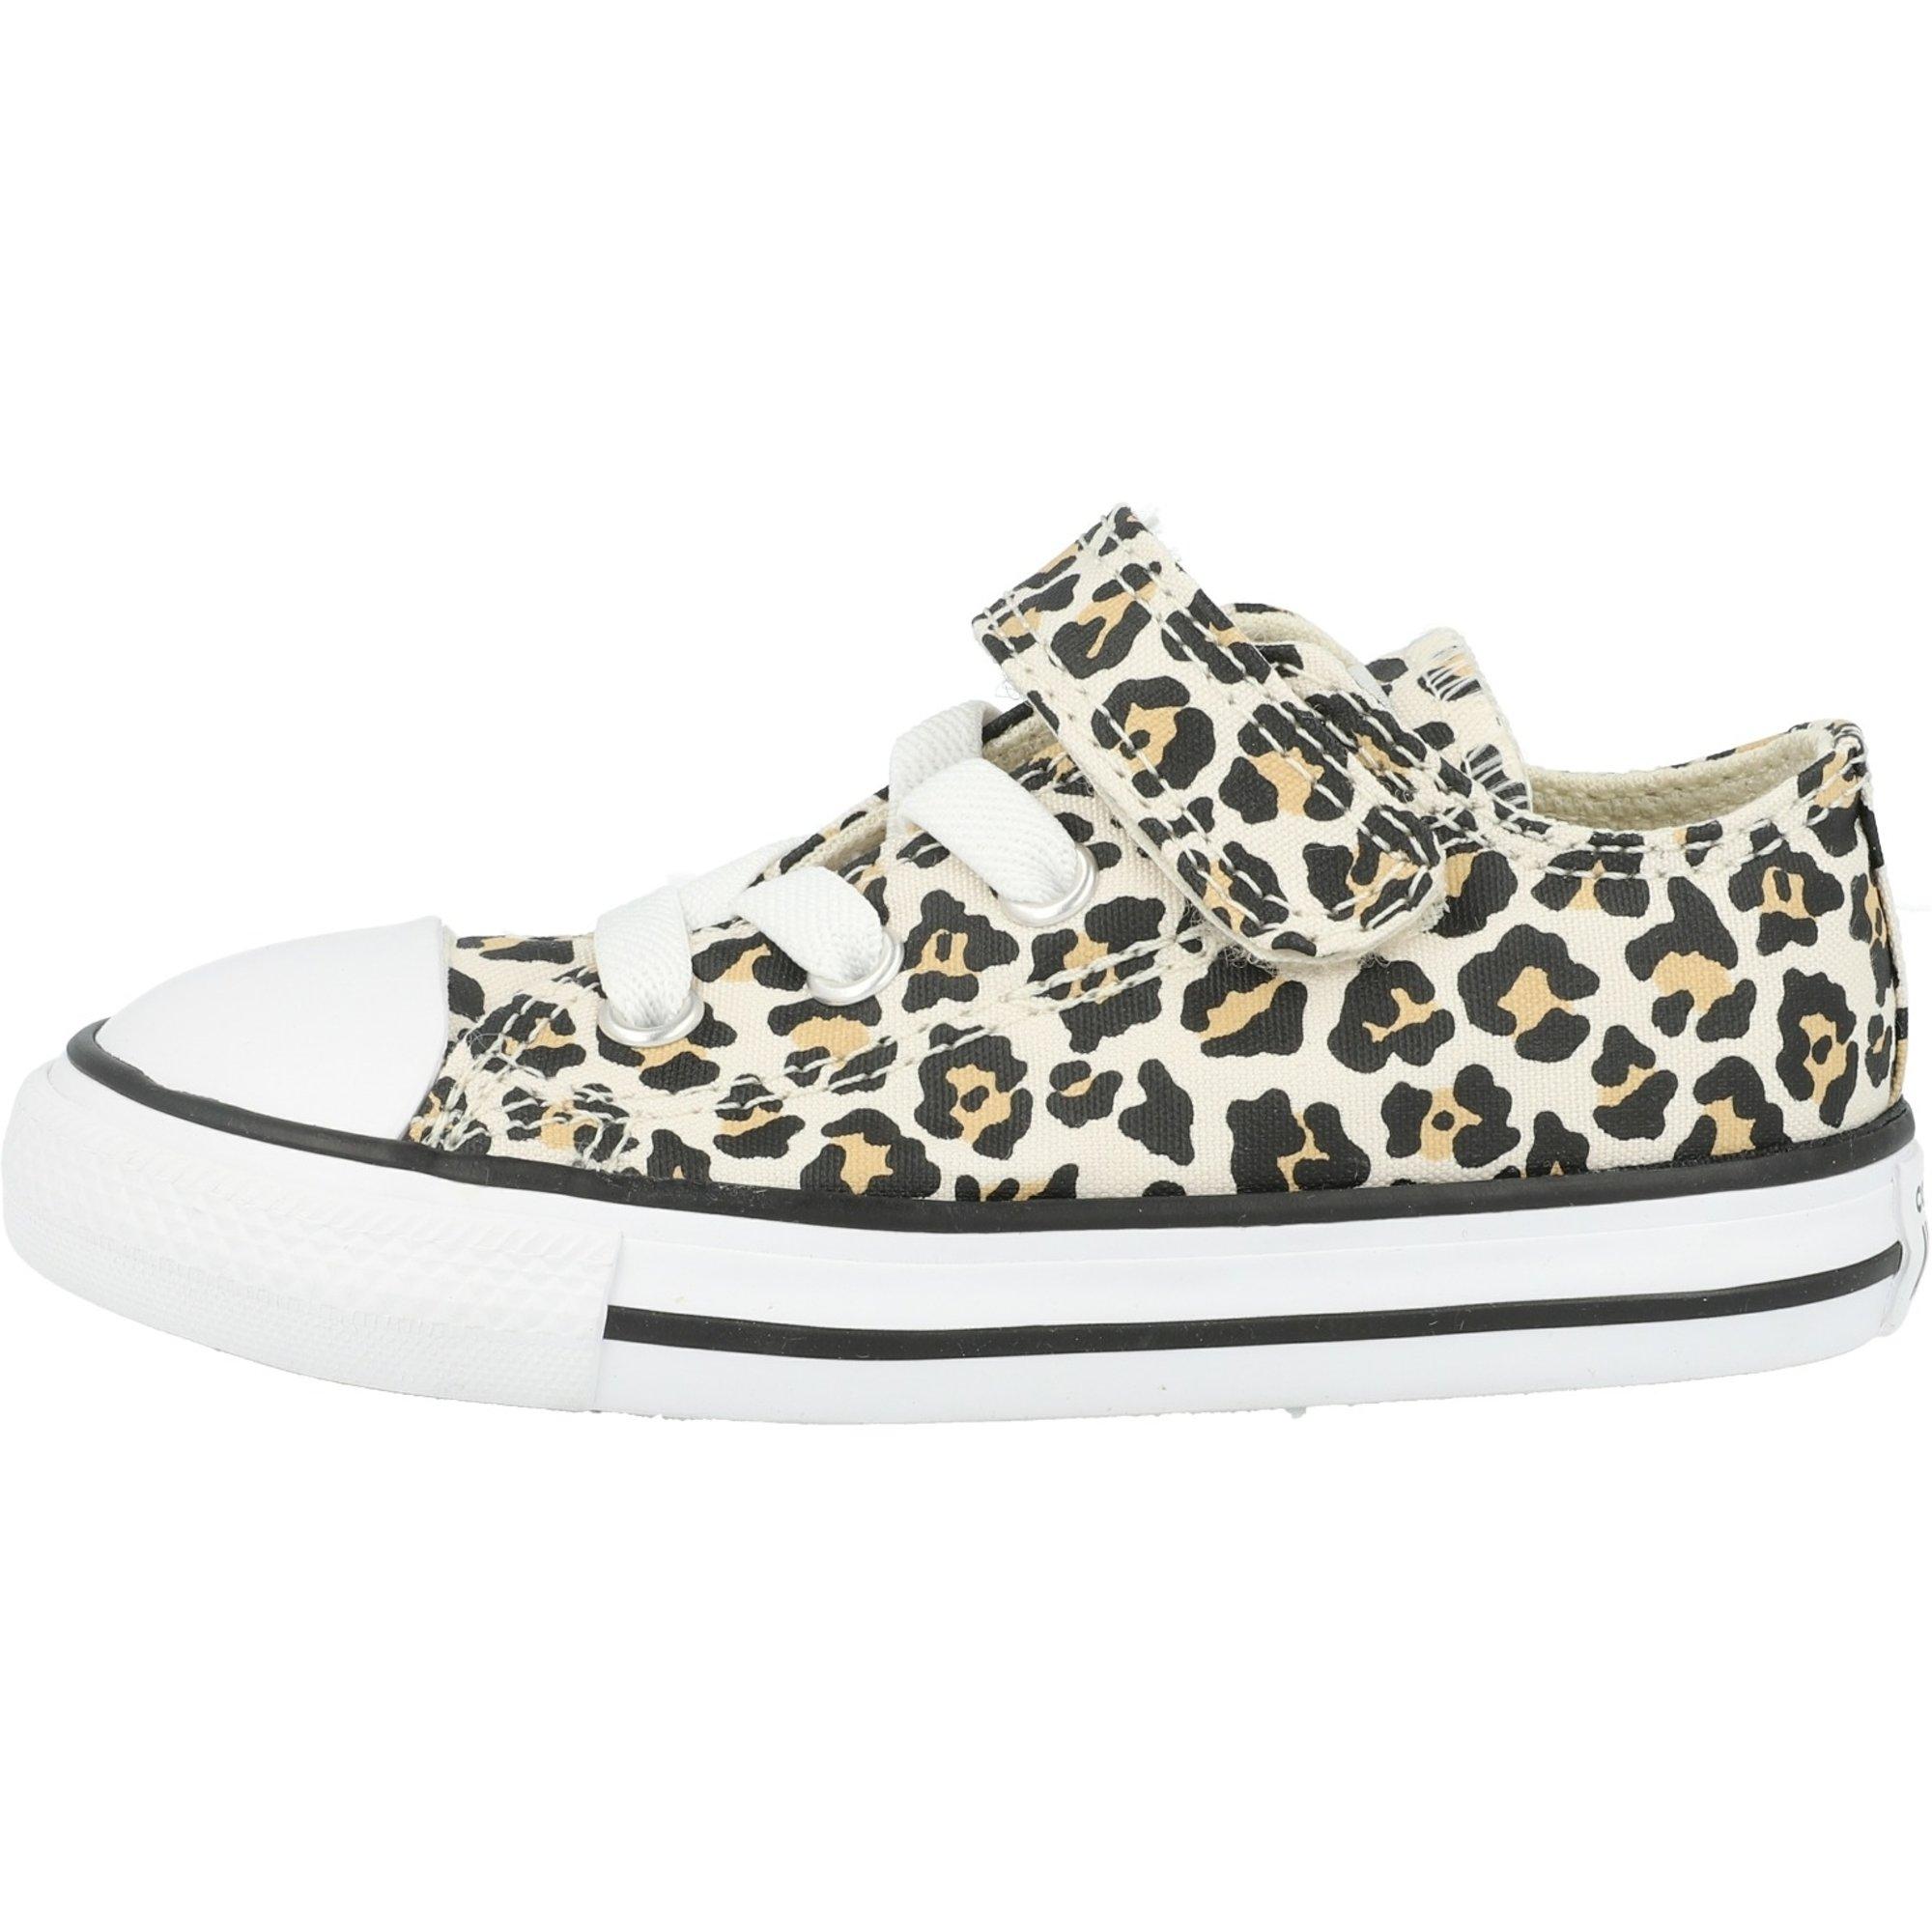 converse all star donna leopard